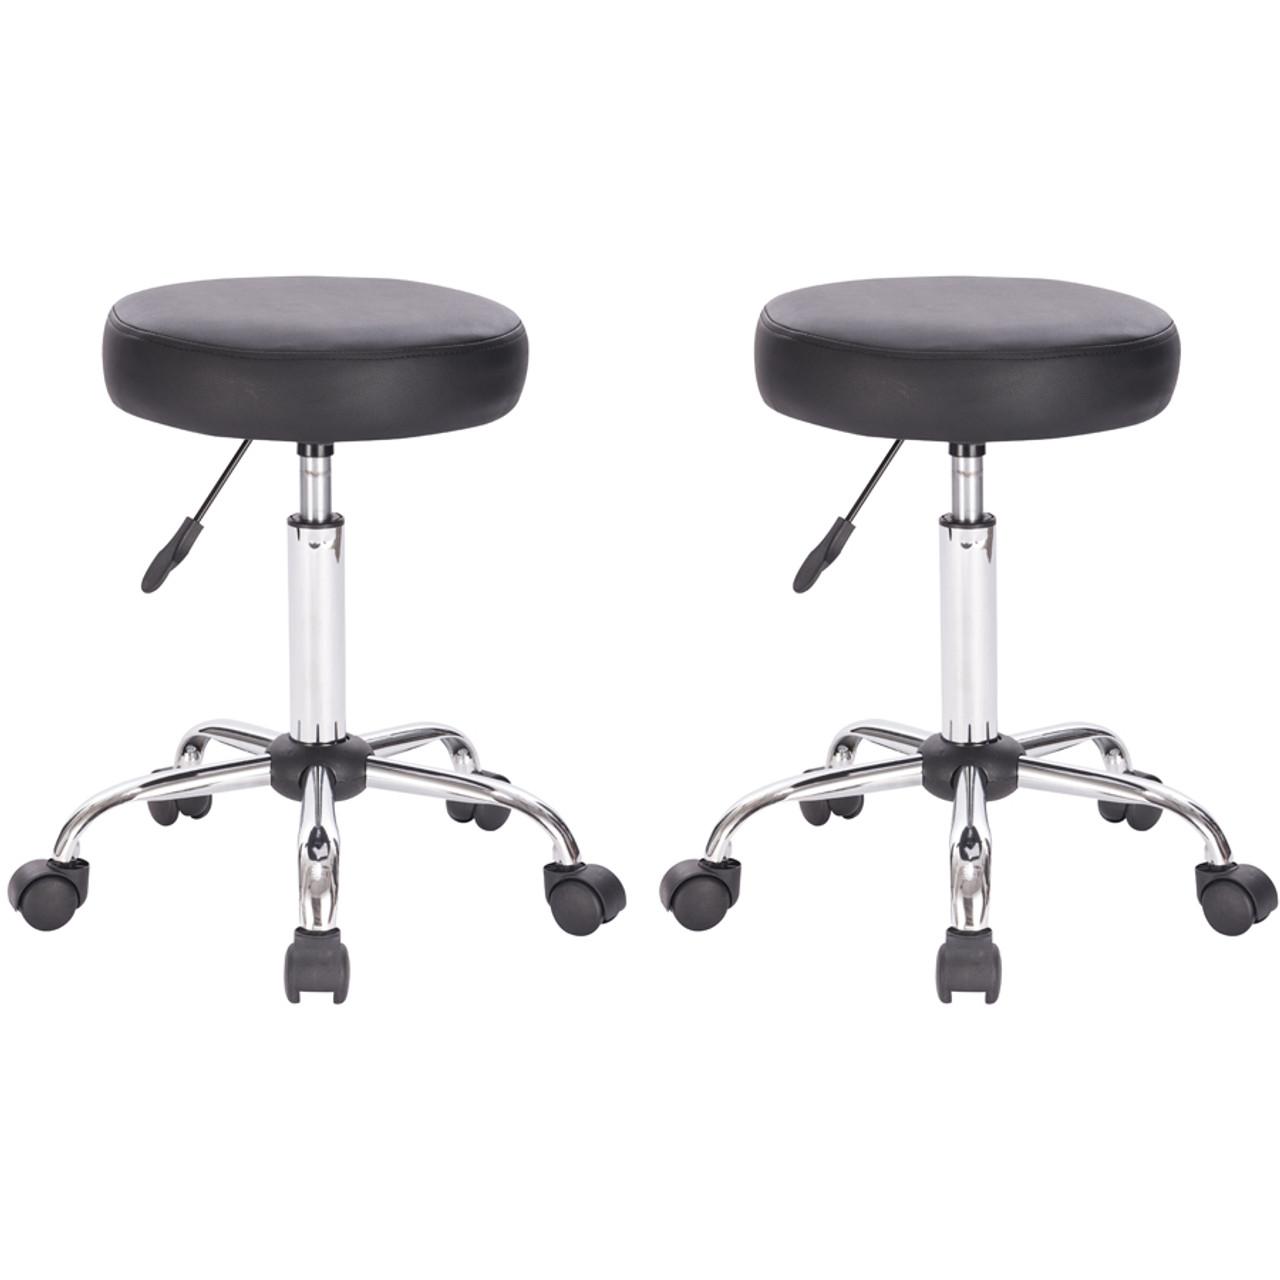 Set of 2 Black Adjustable Height Pneumatic Round Roller Stool with Chrome Base in USA, California, New York, New York City, Los Angeles, San Francisco, Pennsylvania, Washington DC, Virginia, Maryland